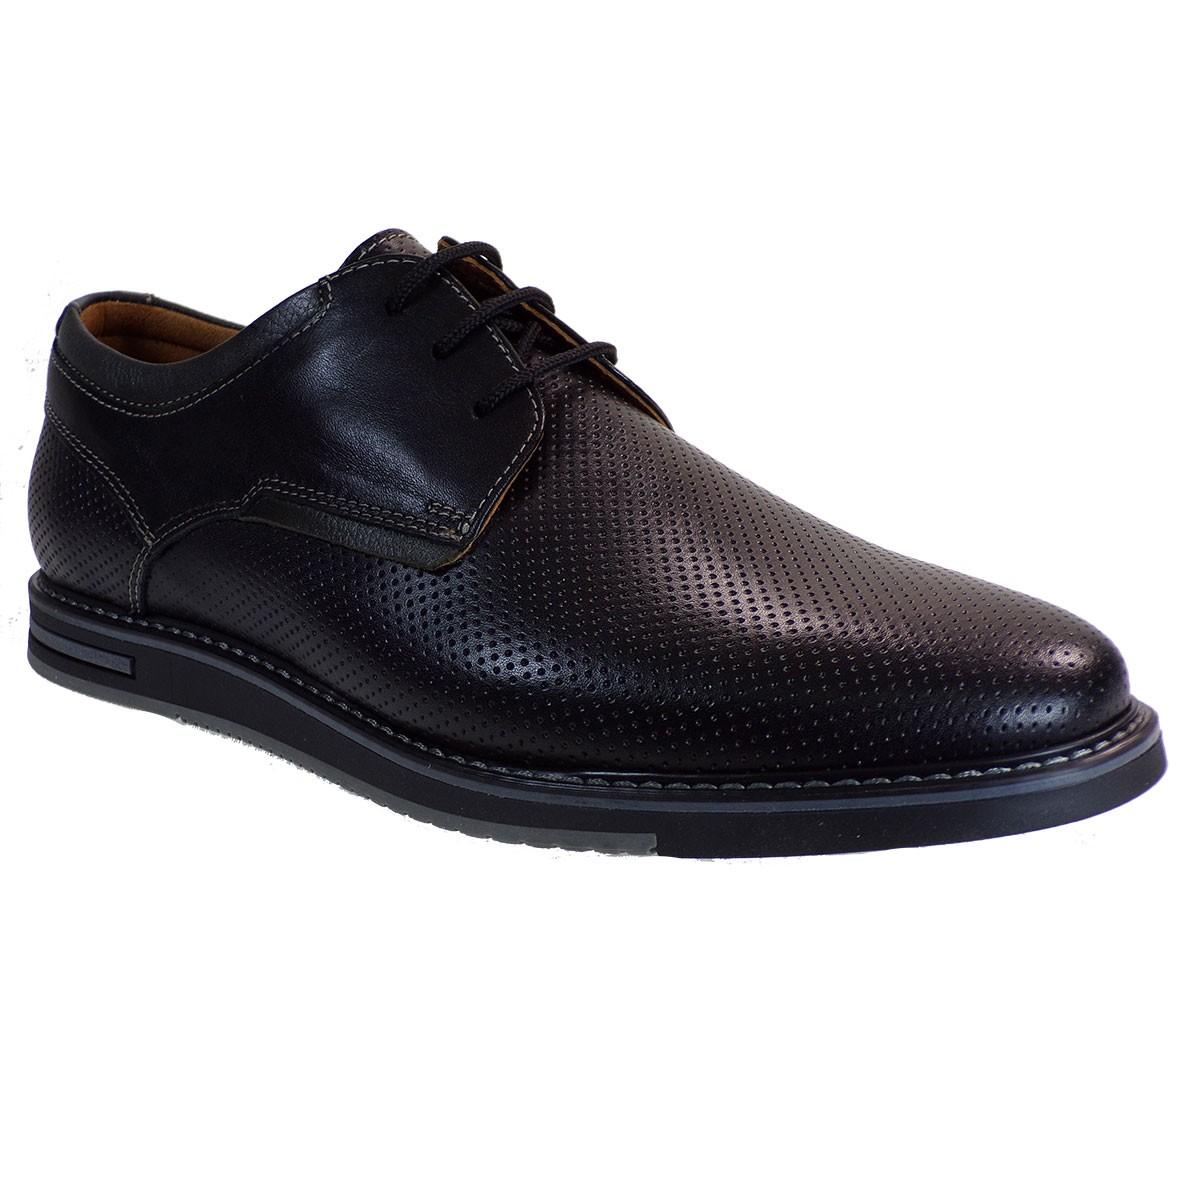 Softies Ανδρικά Παπούτσια 6148 Μαύρο Δέρμα